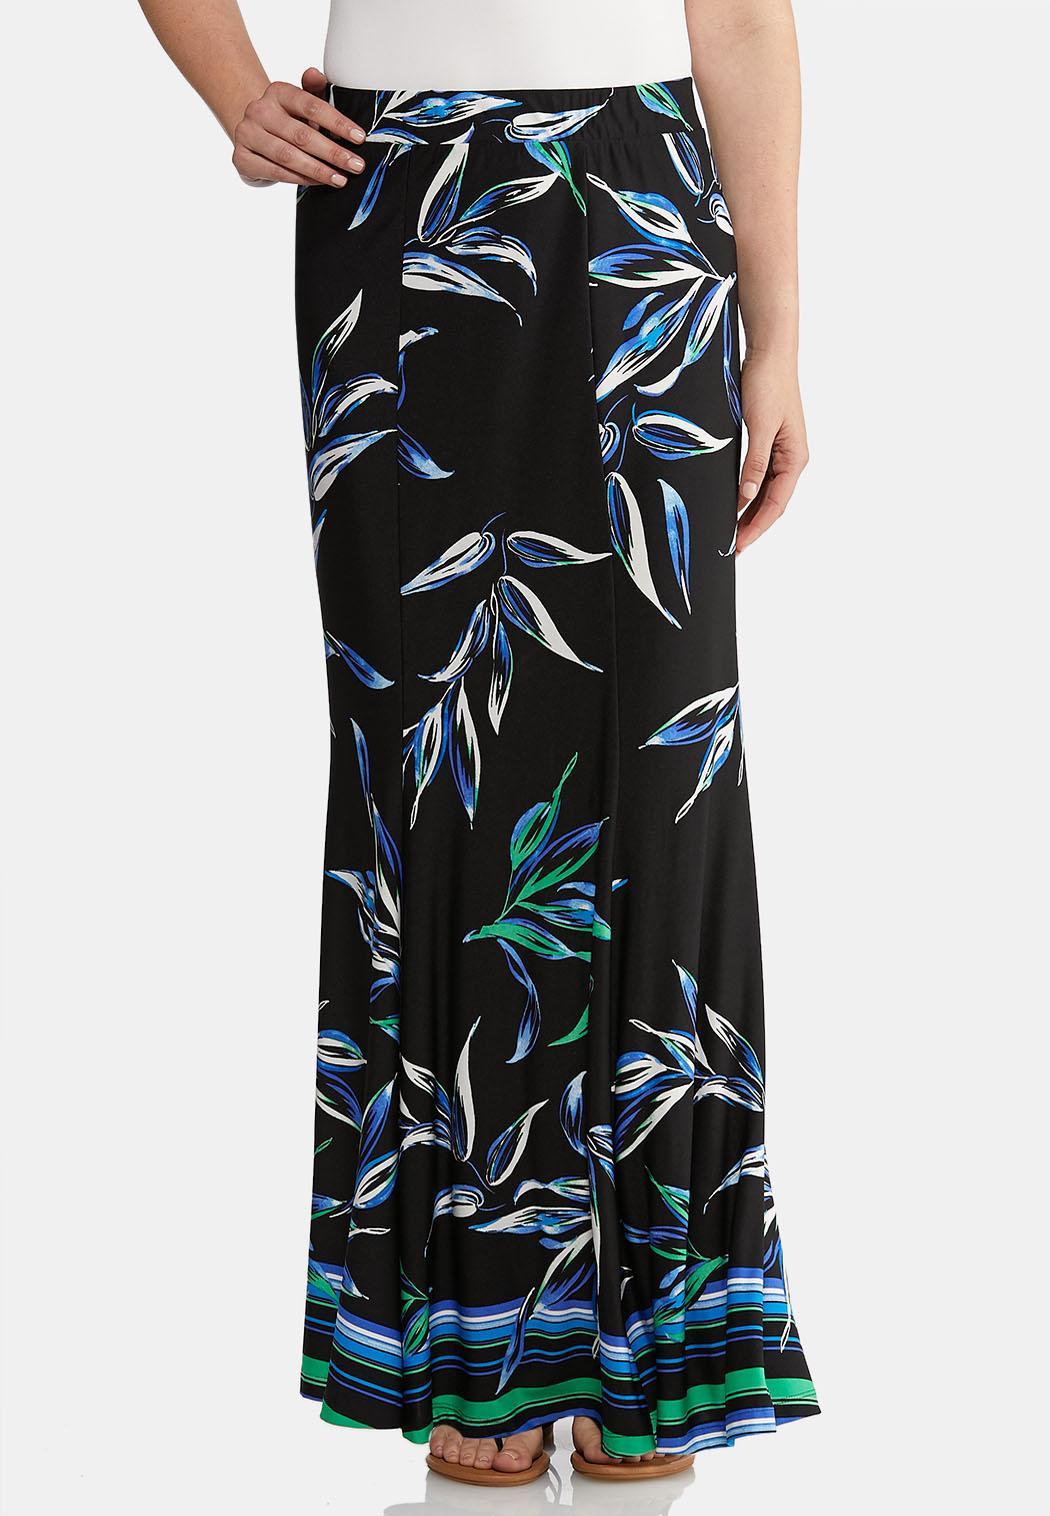 0292b0acb62 Women s Plus Size Skirts